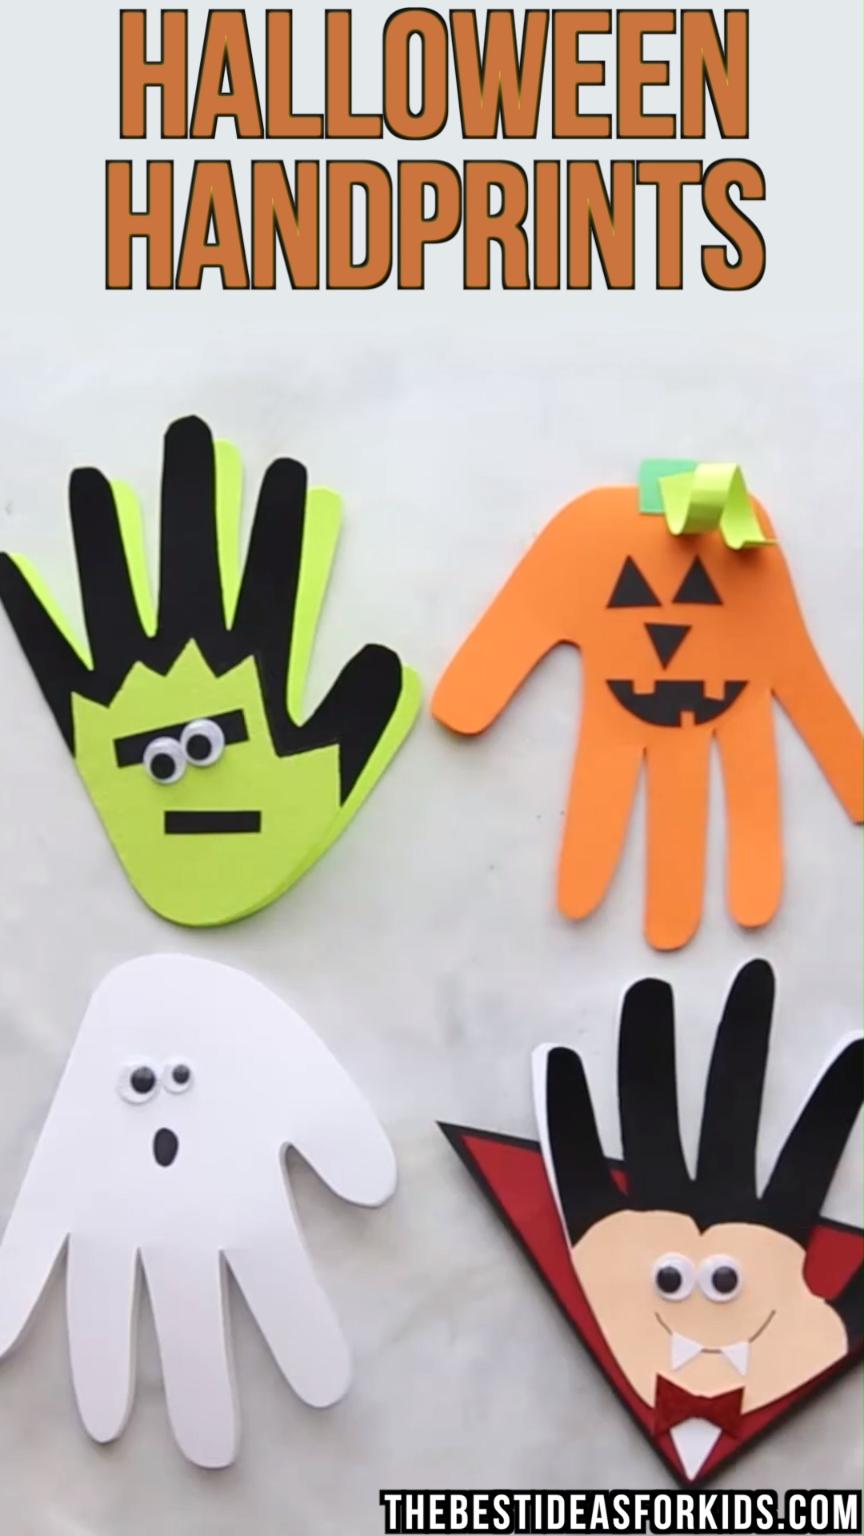 Halloween Handprints - The Best Ideas for Kids